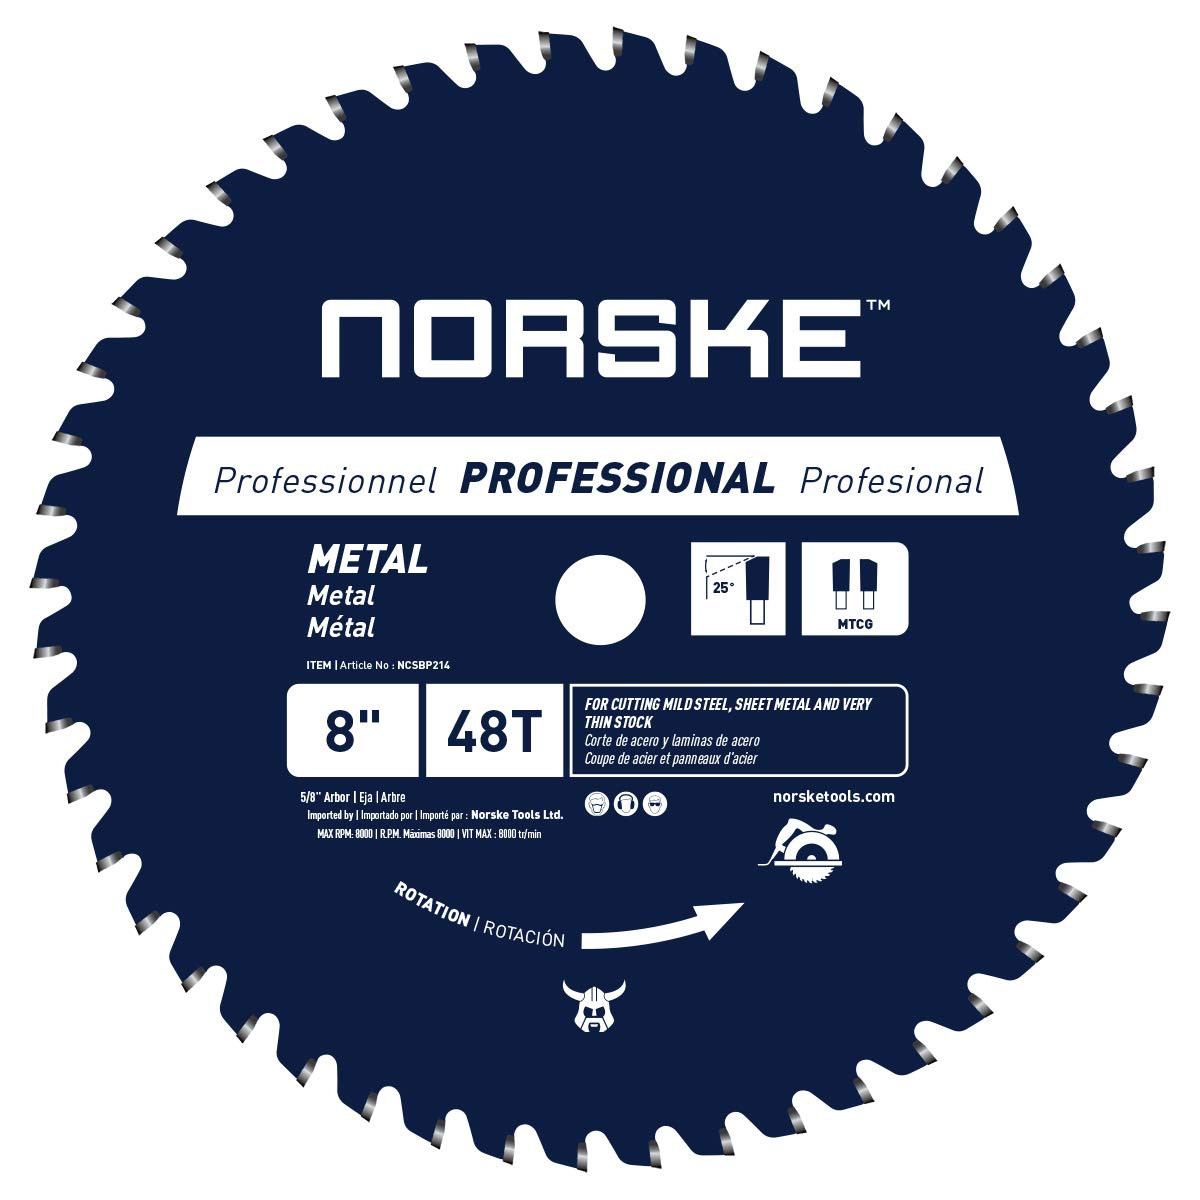 Disco Sierra NORSKE NCSBP214 8 x 48T Corte de metal para t